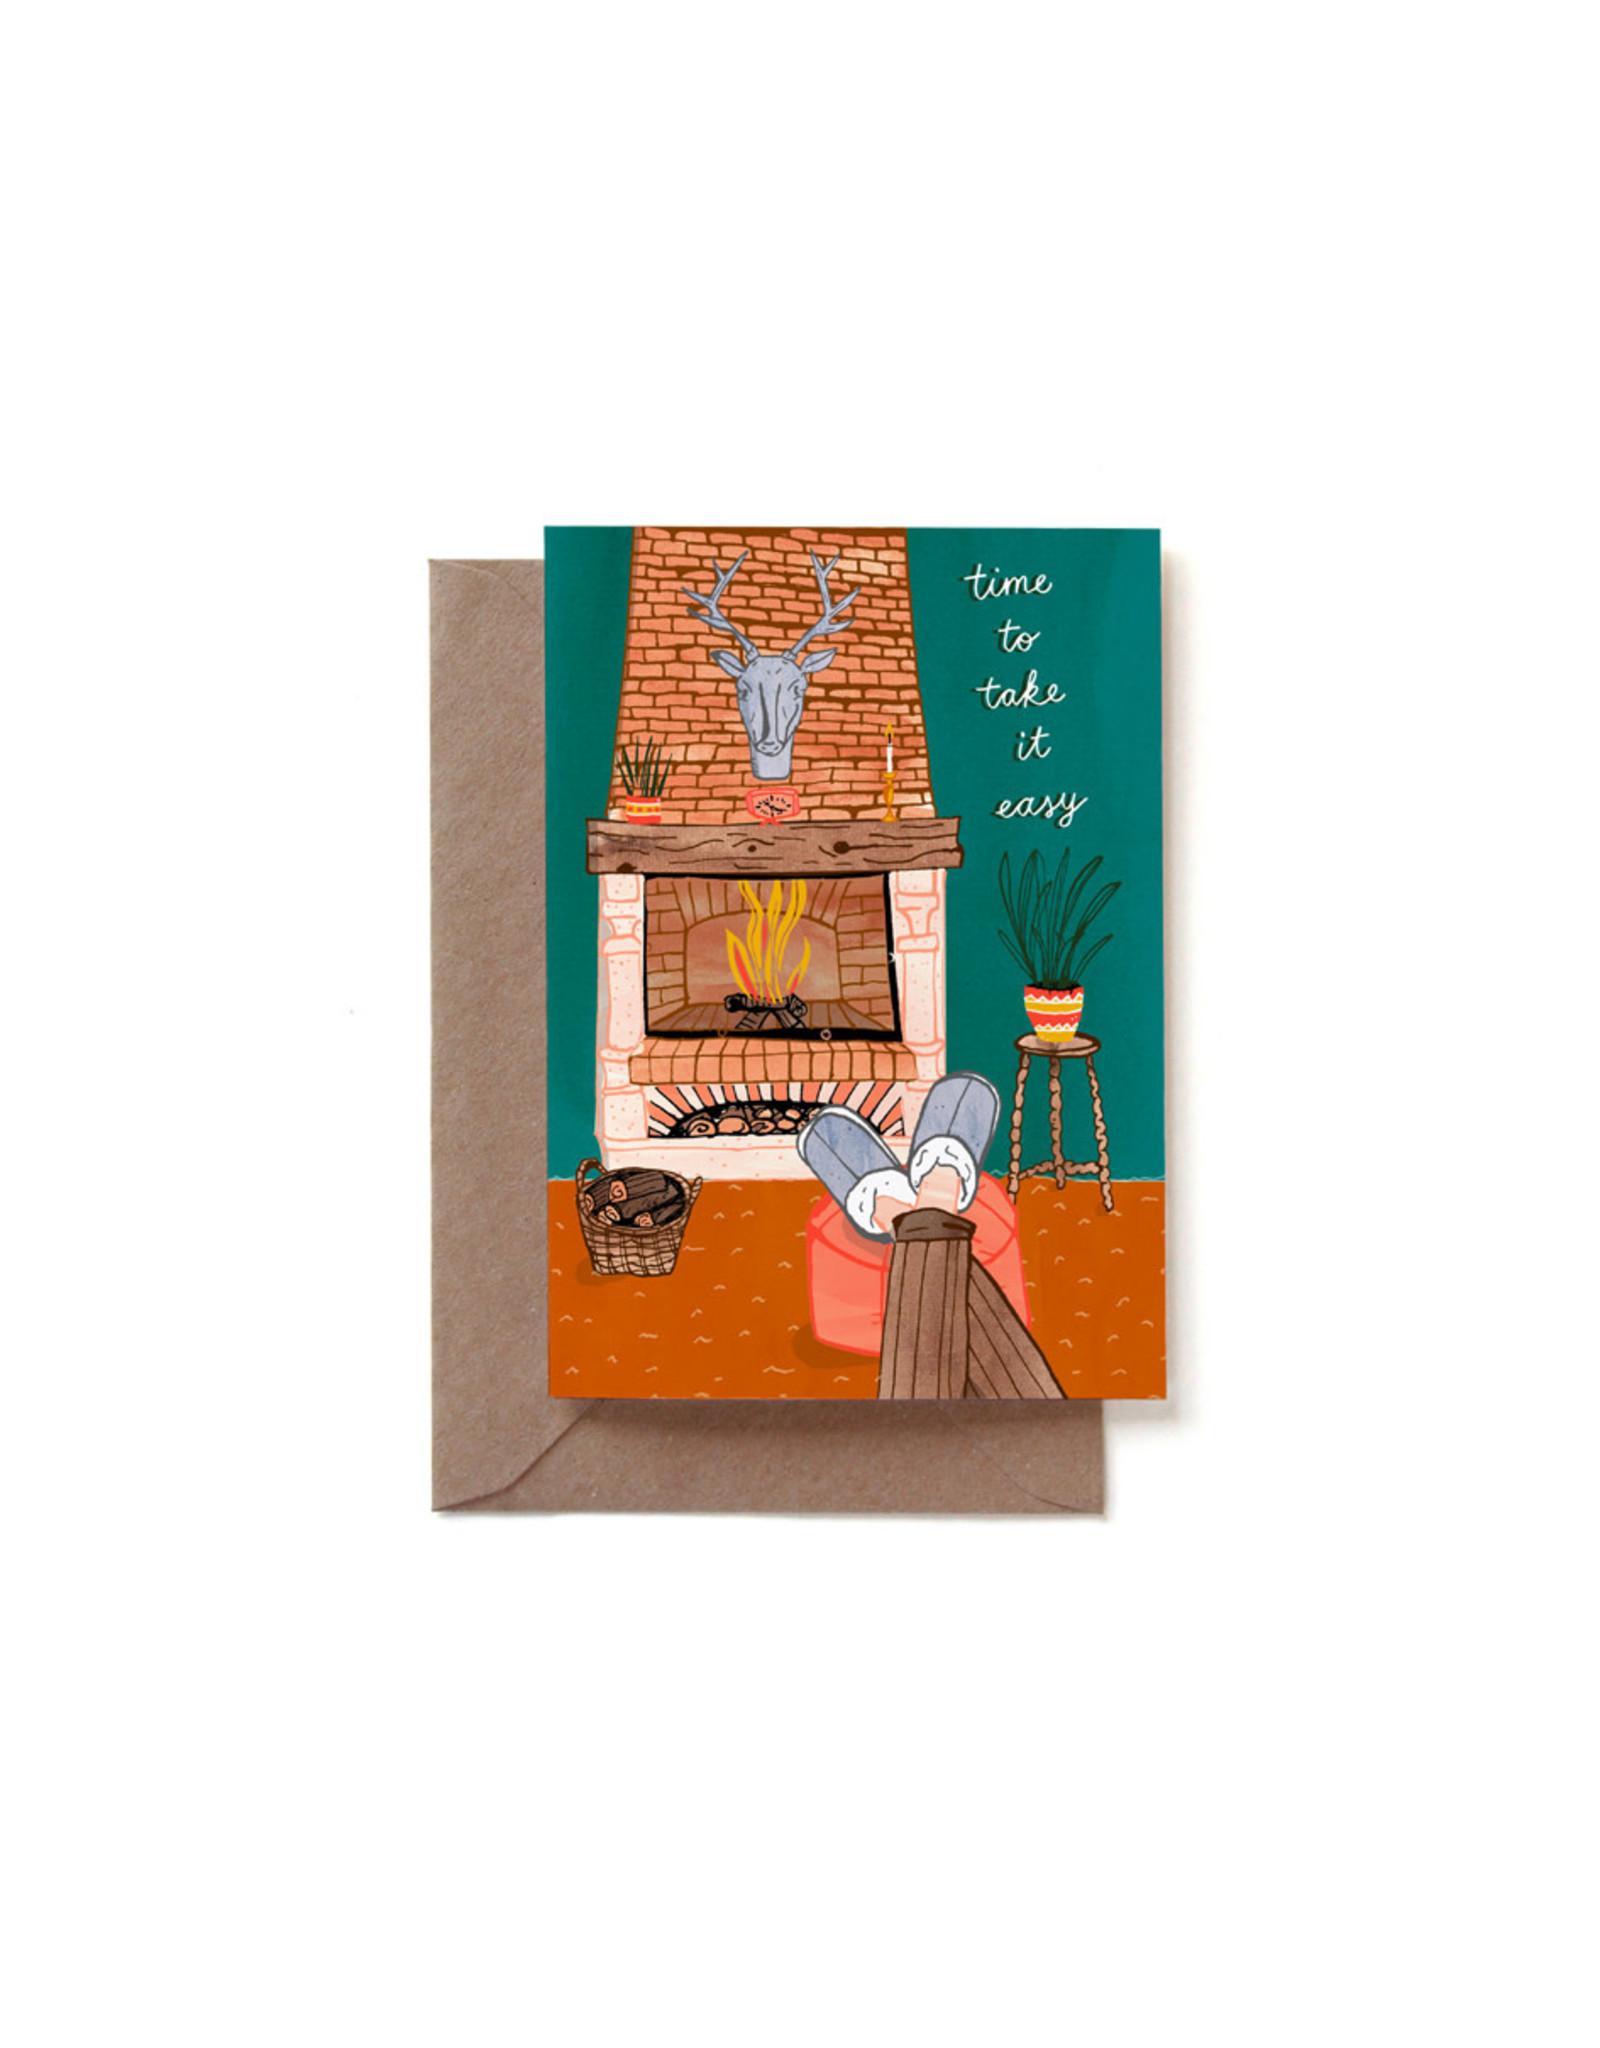 Reddish Design Wenskaart - Retirement - Dubbele kaart + Envelope - 10 x 15cm